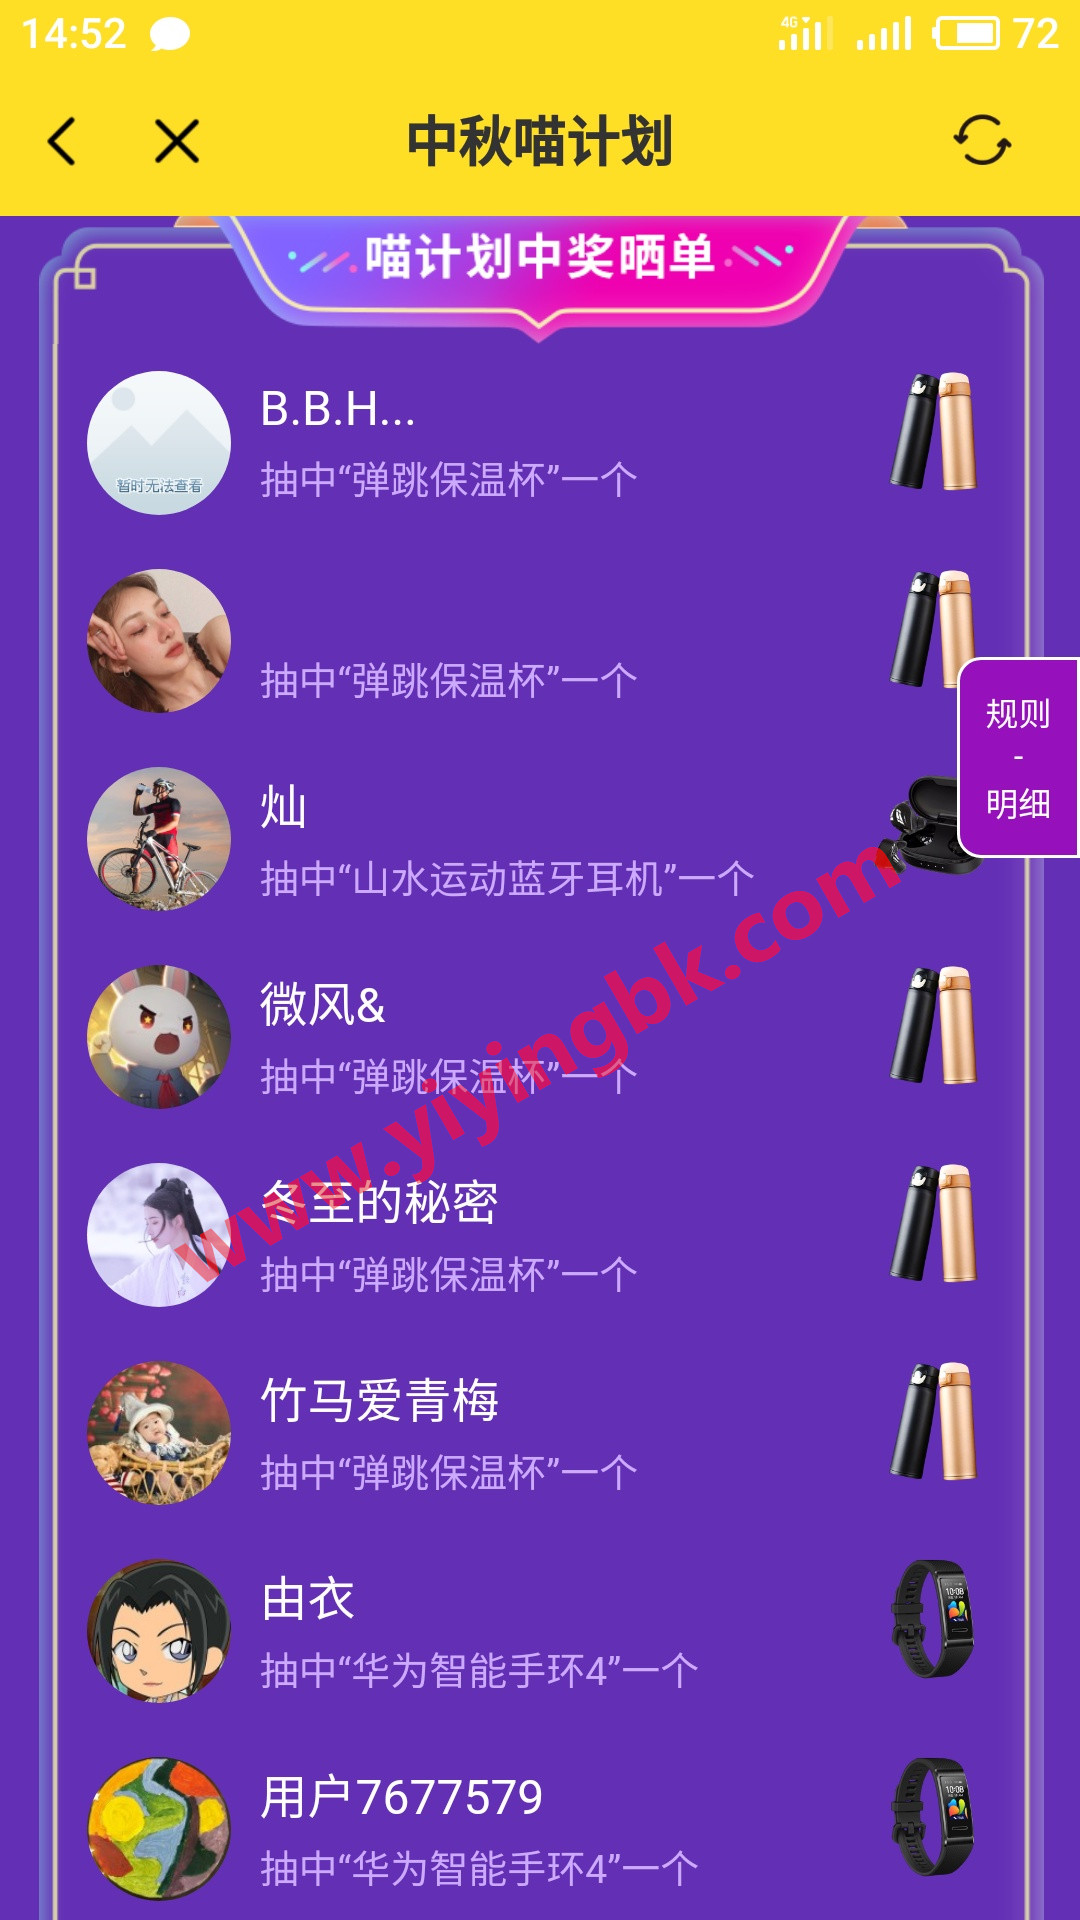 中秋喵计划中奖名单,www.yiyingbk.com